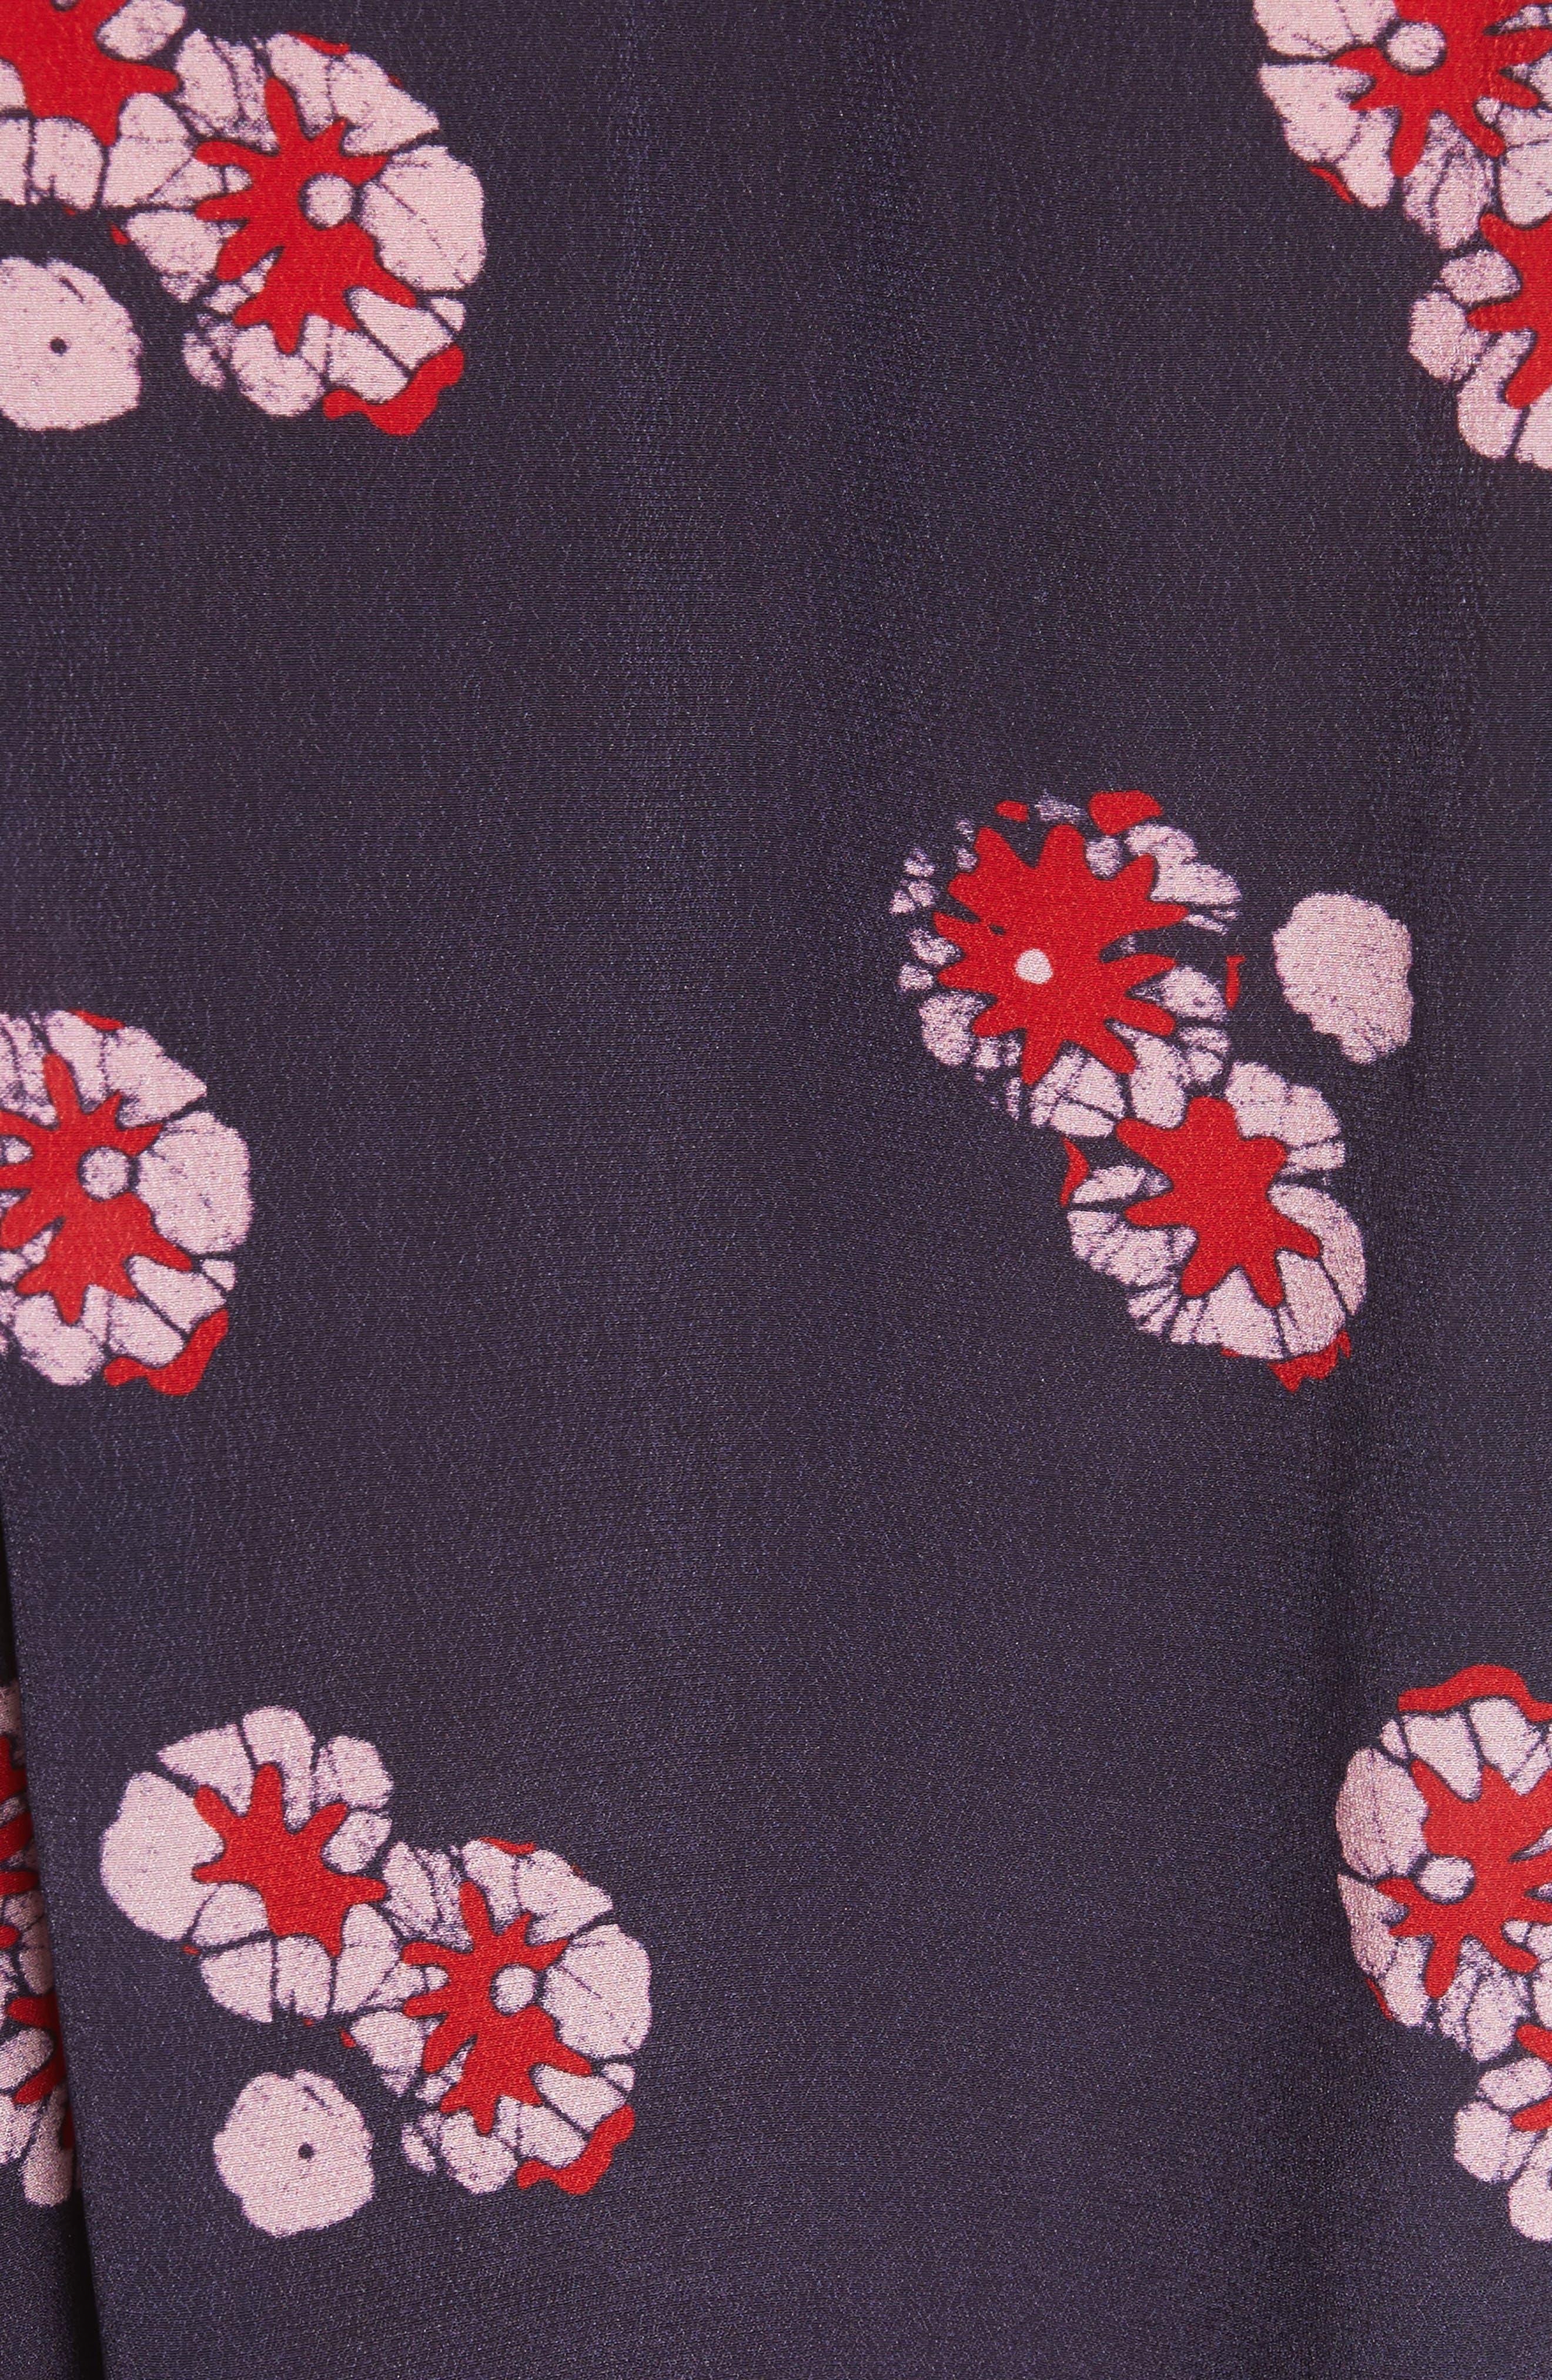 Print Ruffle Sleeve Top,                             Alternate thumbnail 6, color,                             Red Multi